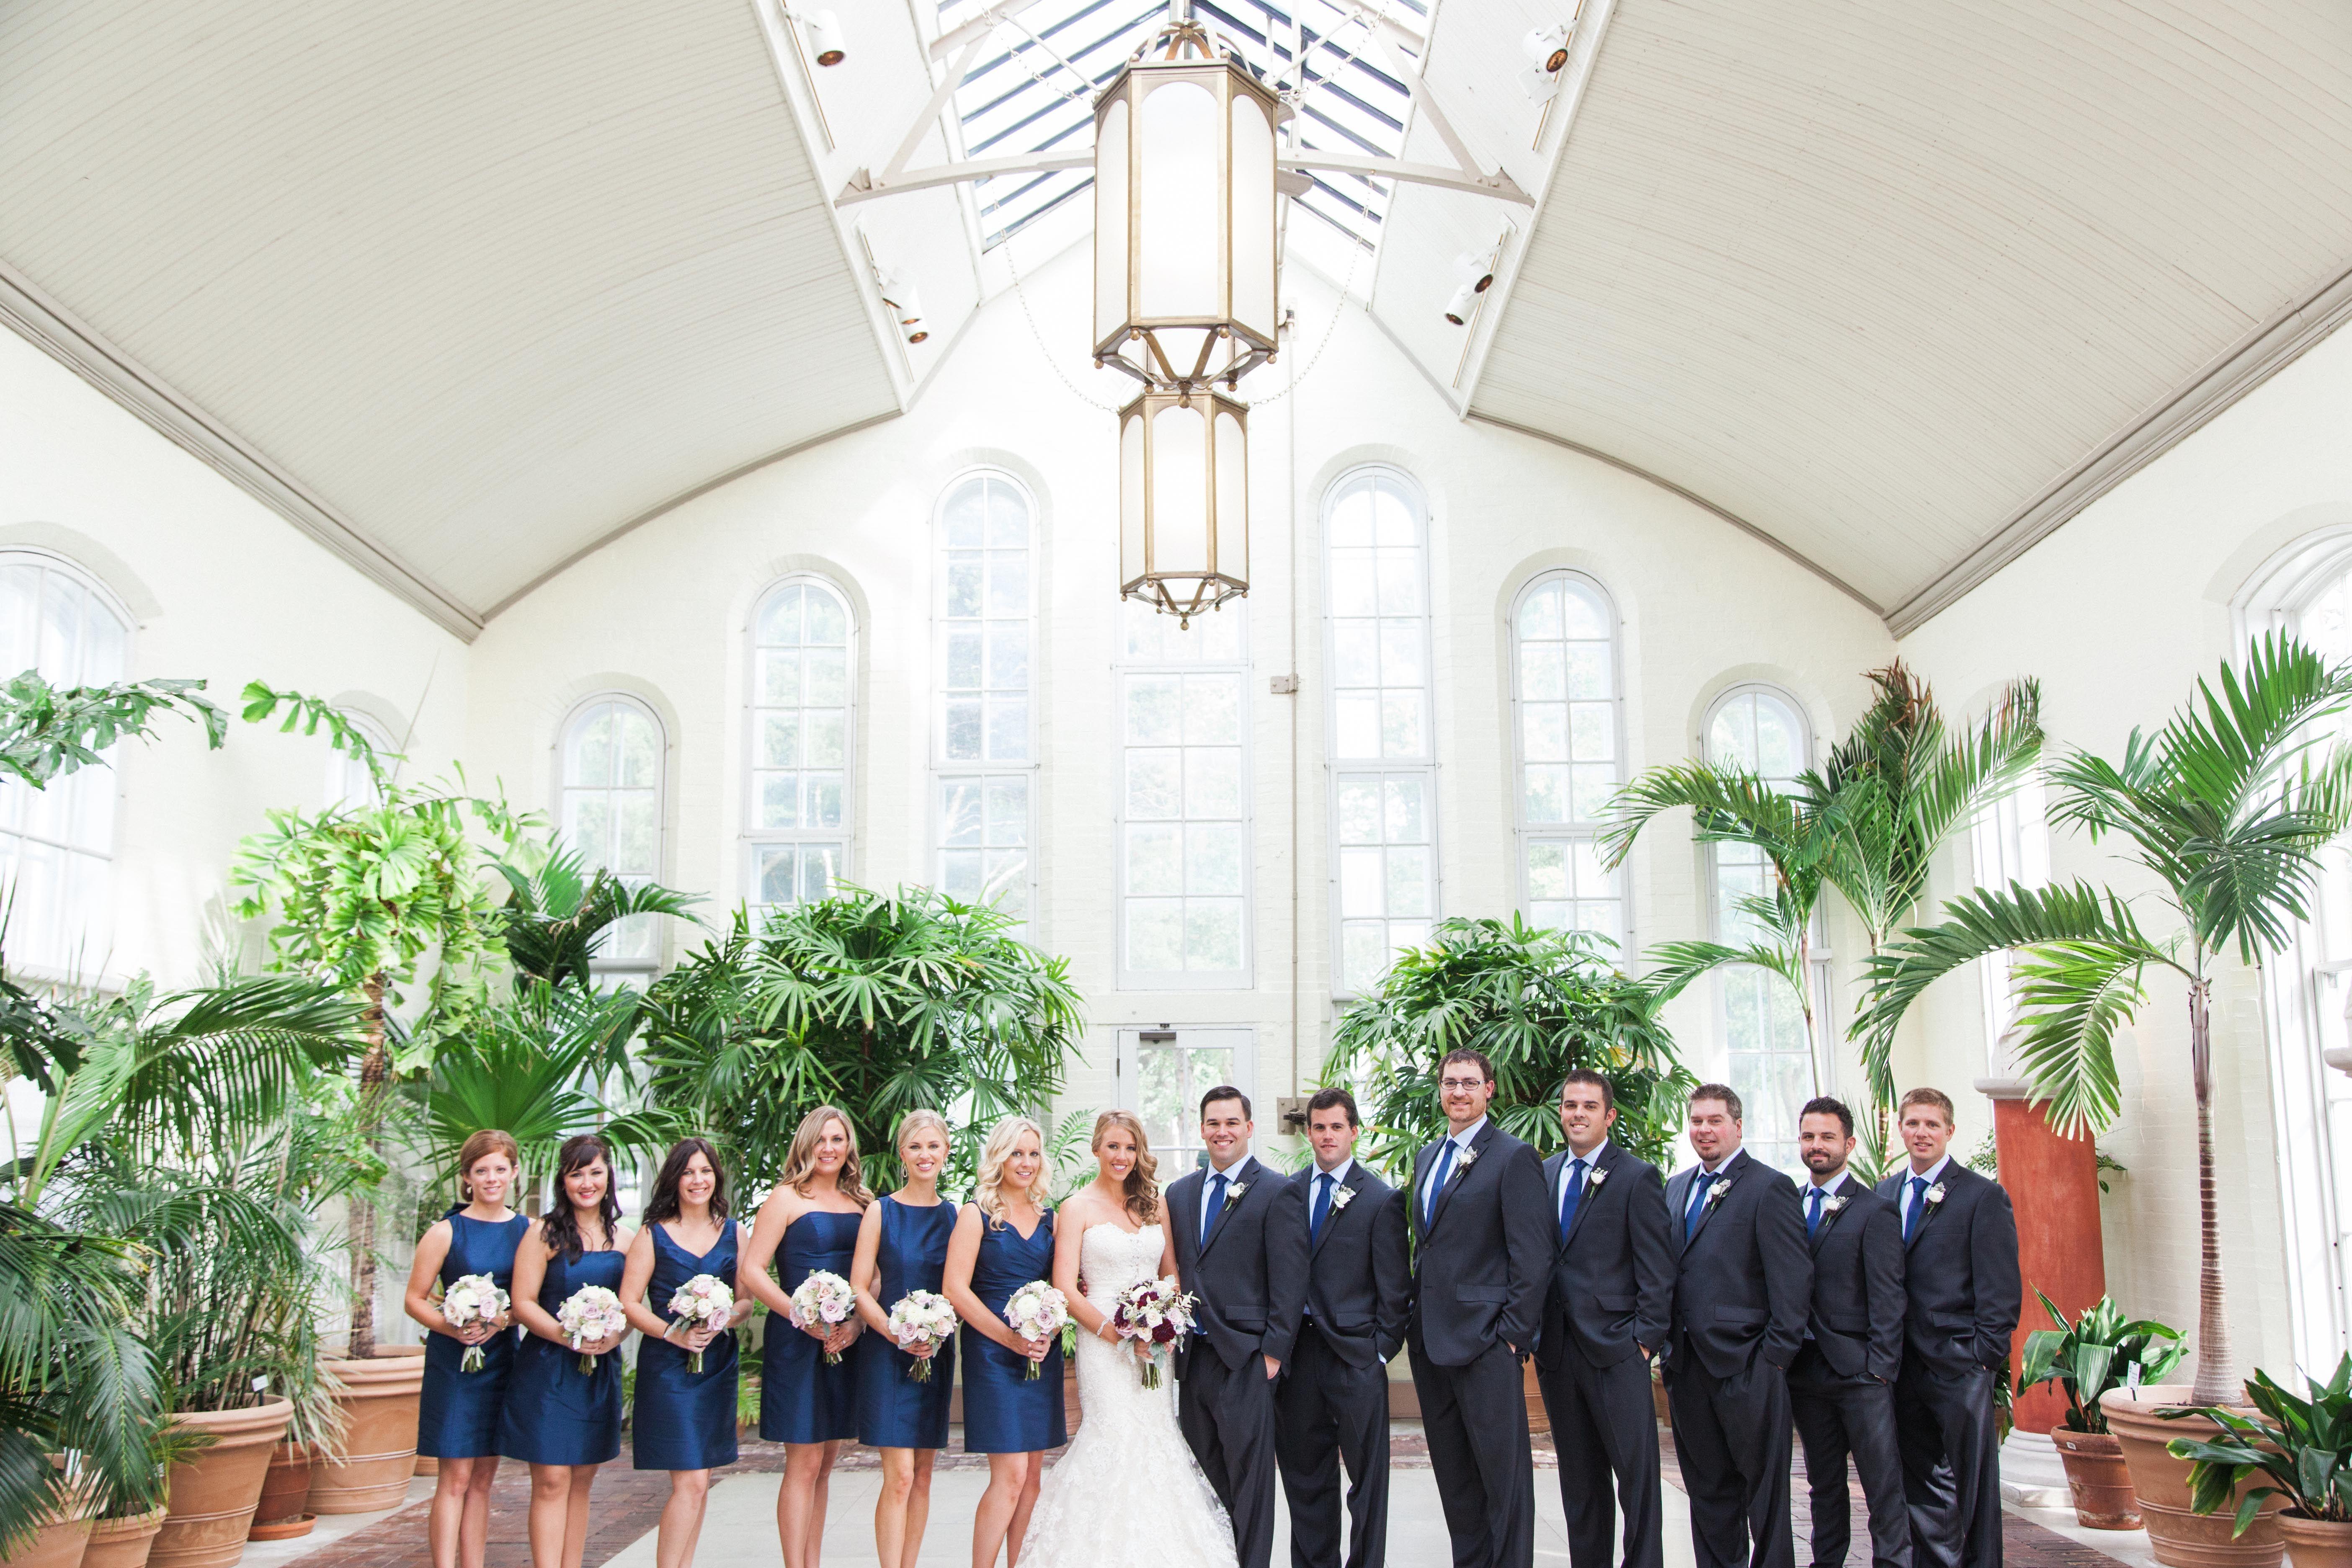 Navy Bridesmaid Dresses, Charcoal Groomsmen Suits | WEDDING ...